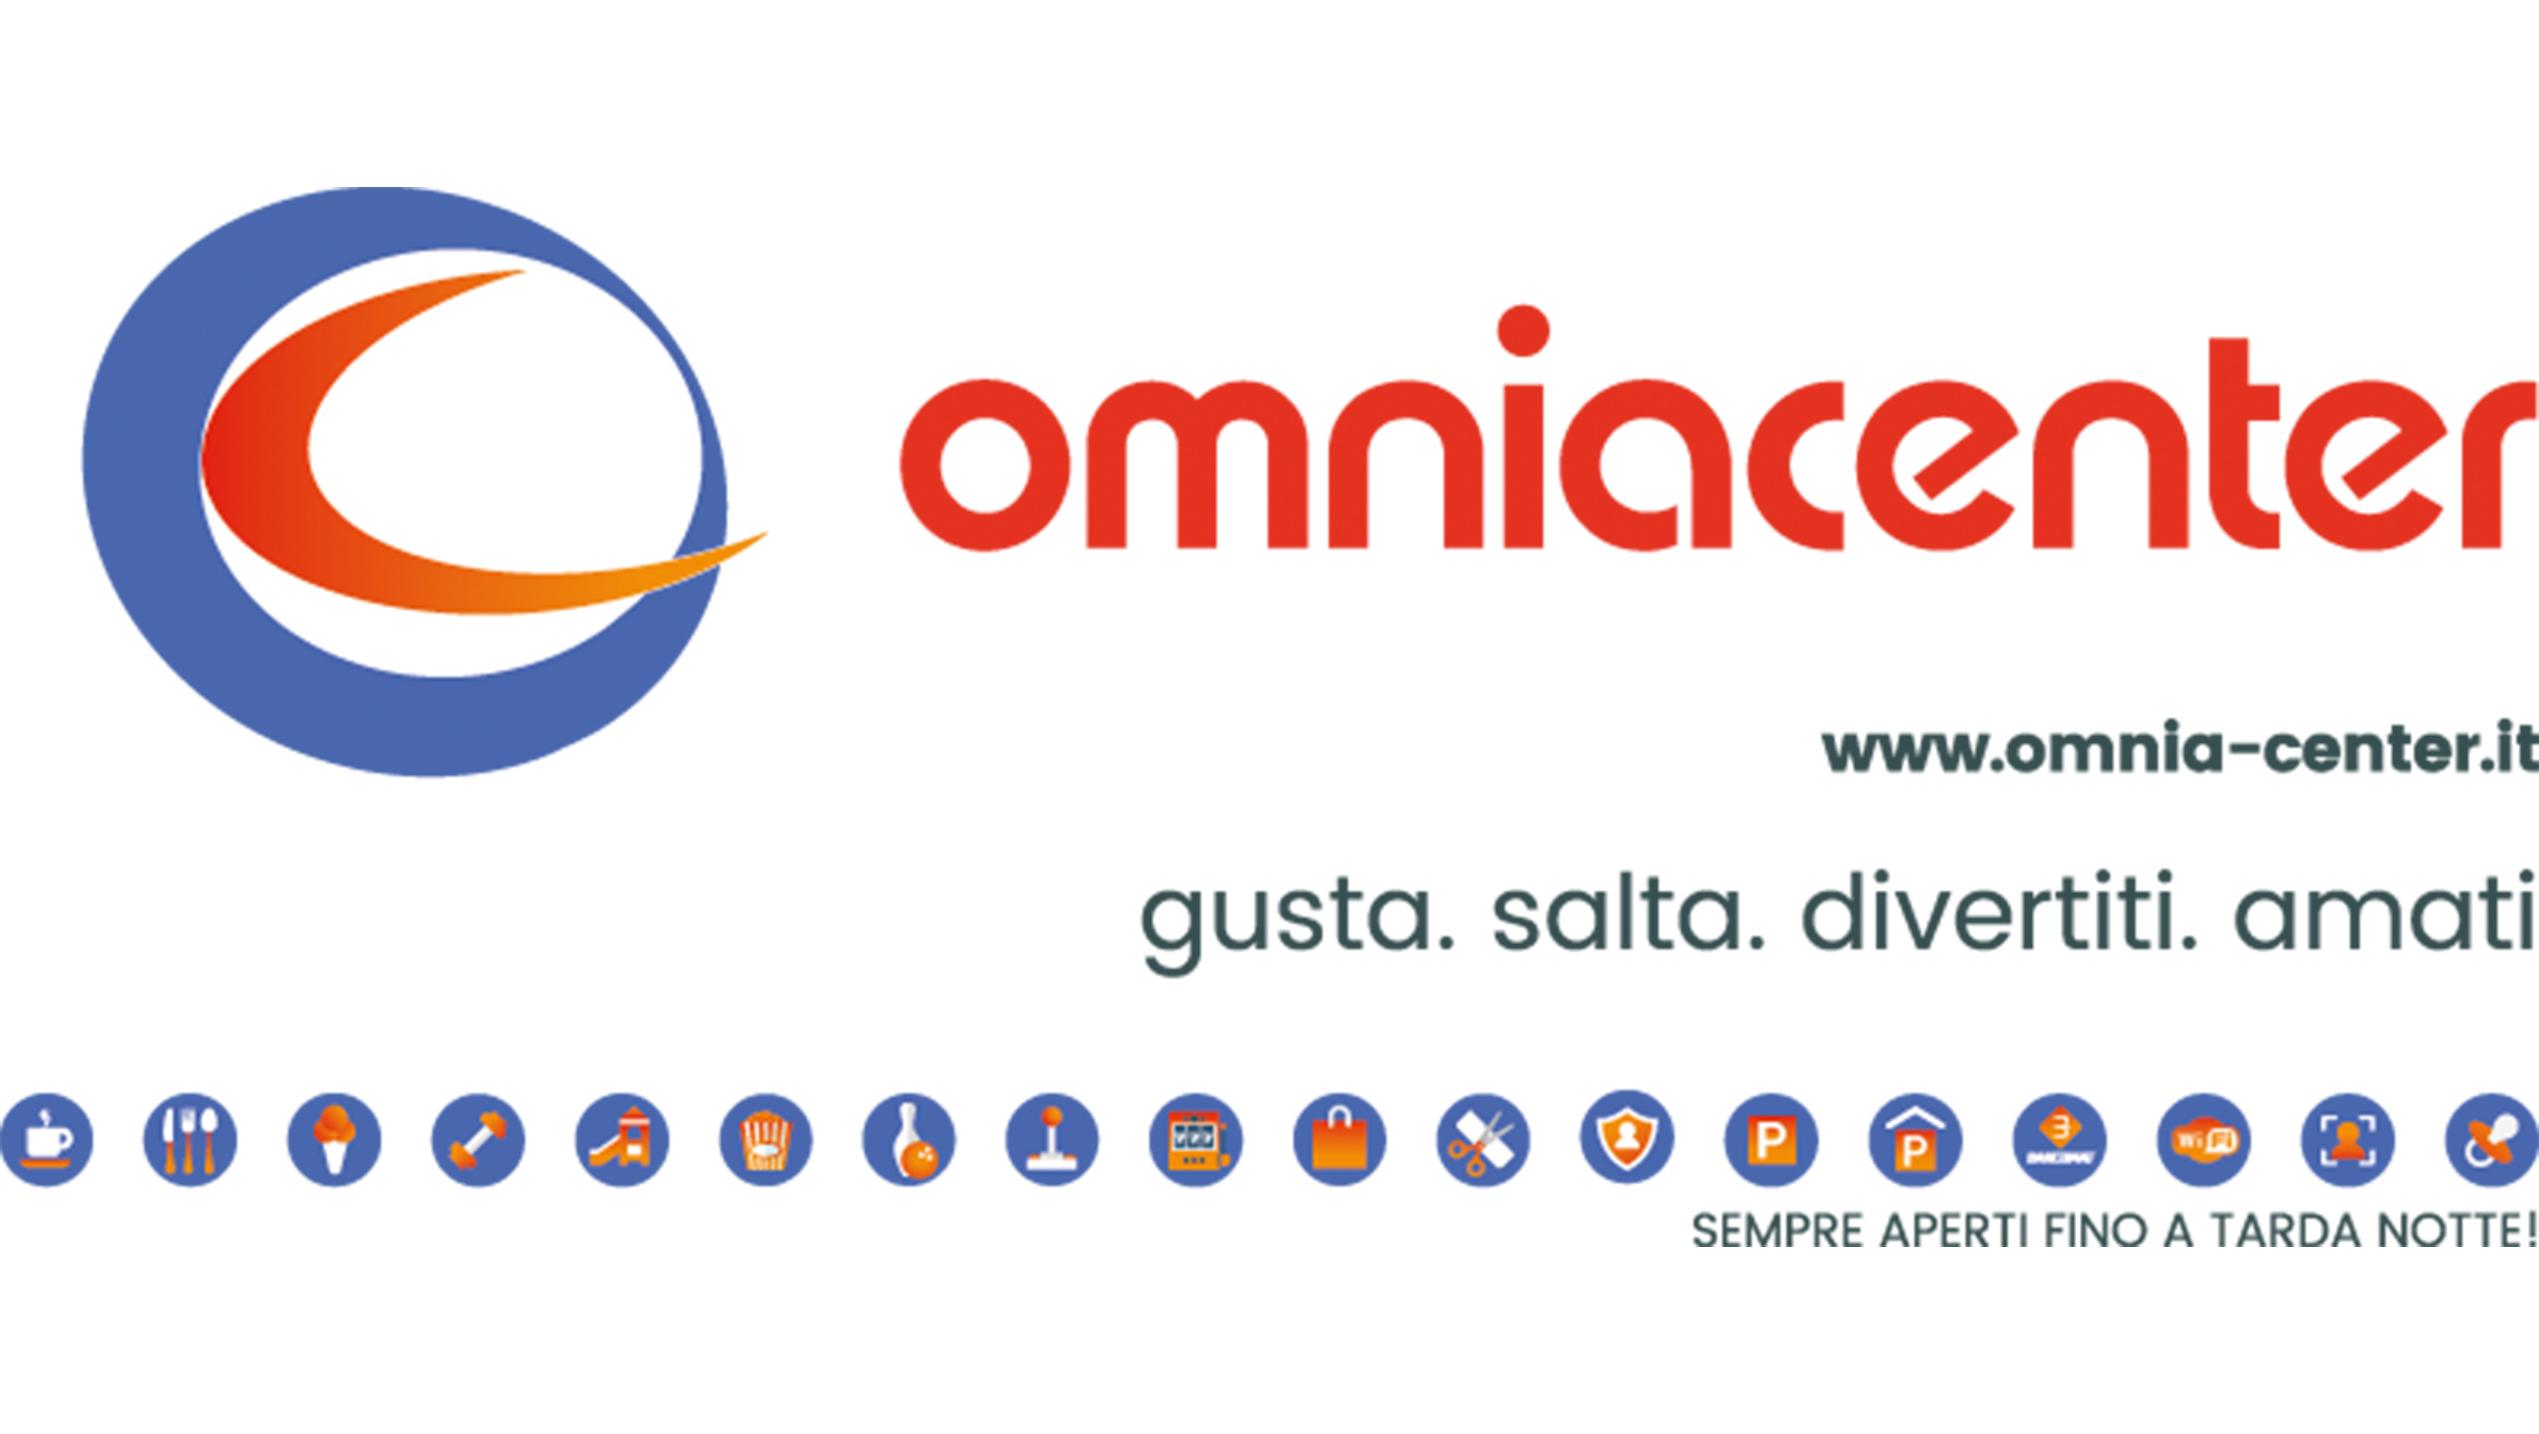 Omniacenter